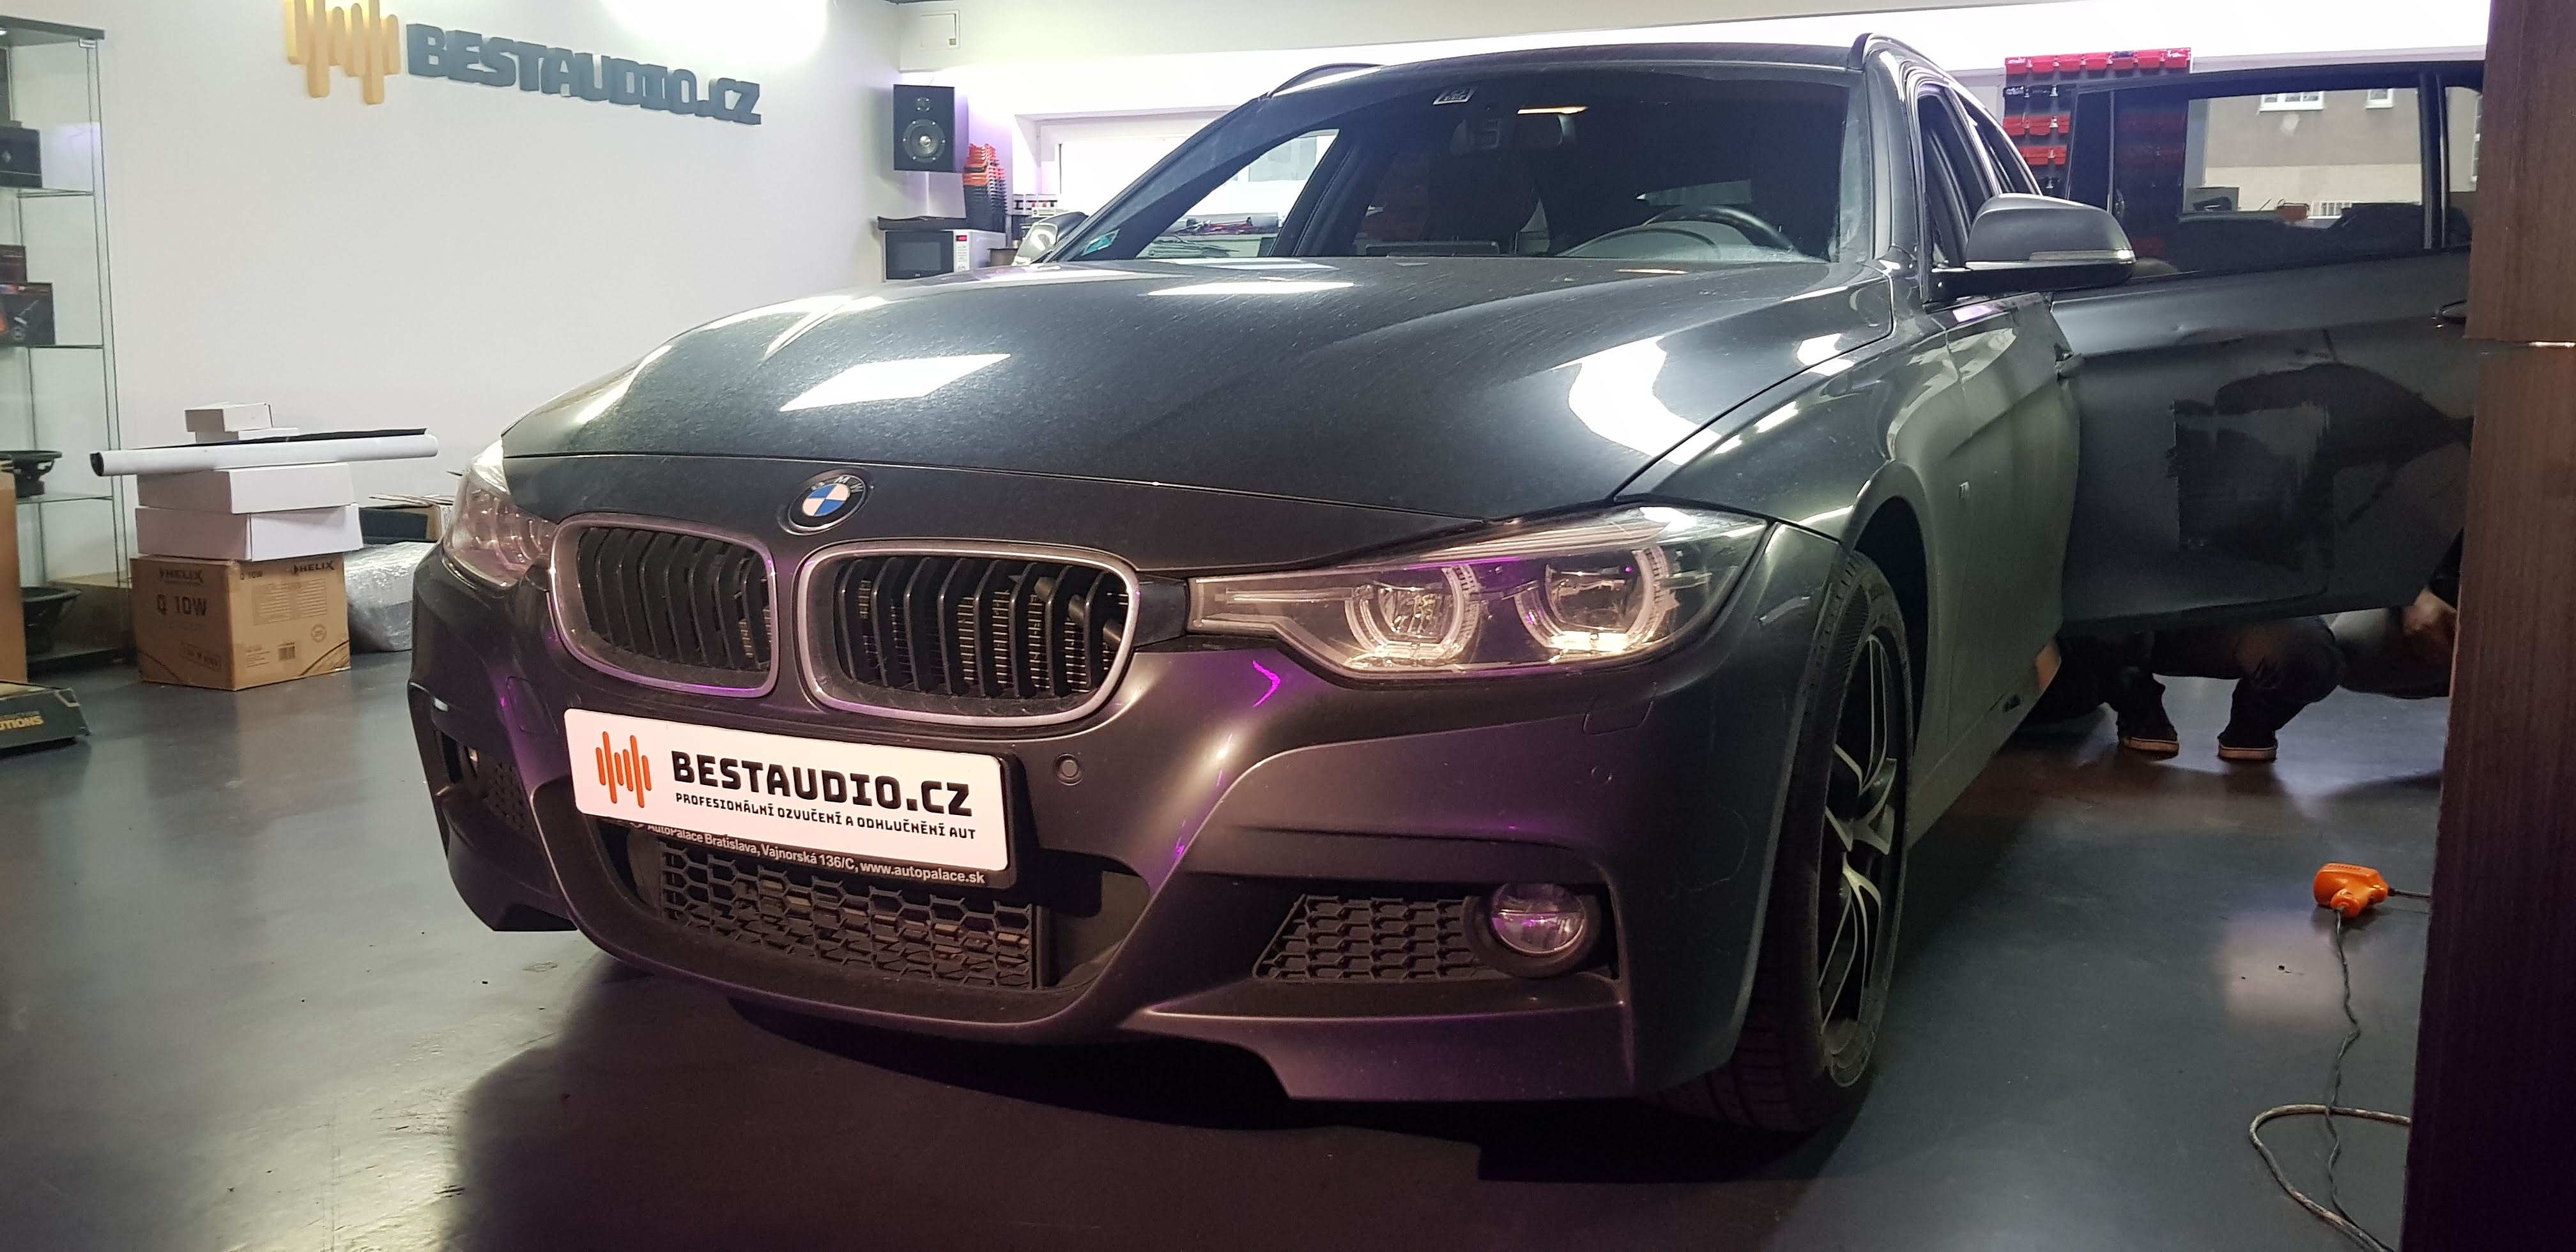 BMW 3 (F31) – ozvučení bez zásahu do vozu – upgrade premiového HiFi Sound Systému (option676)